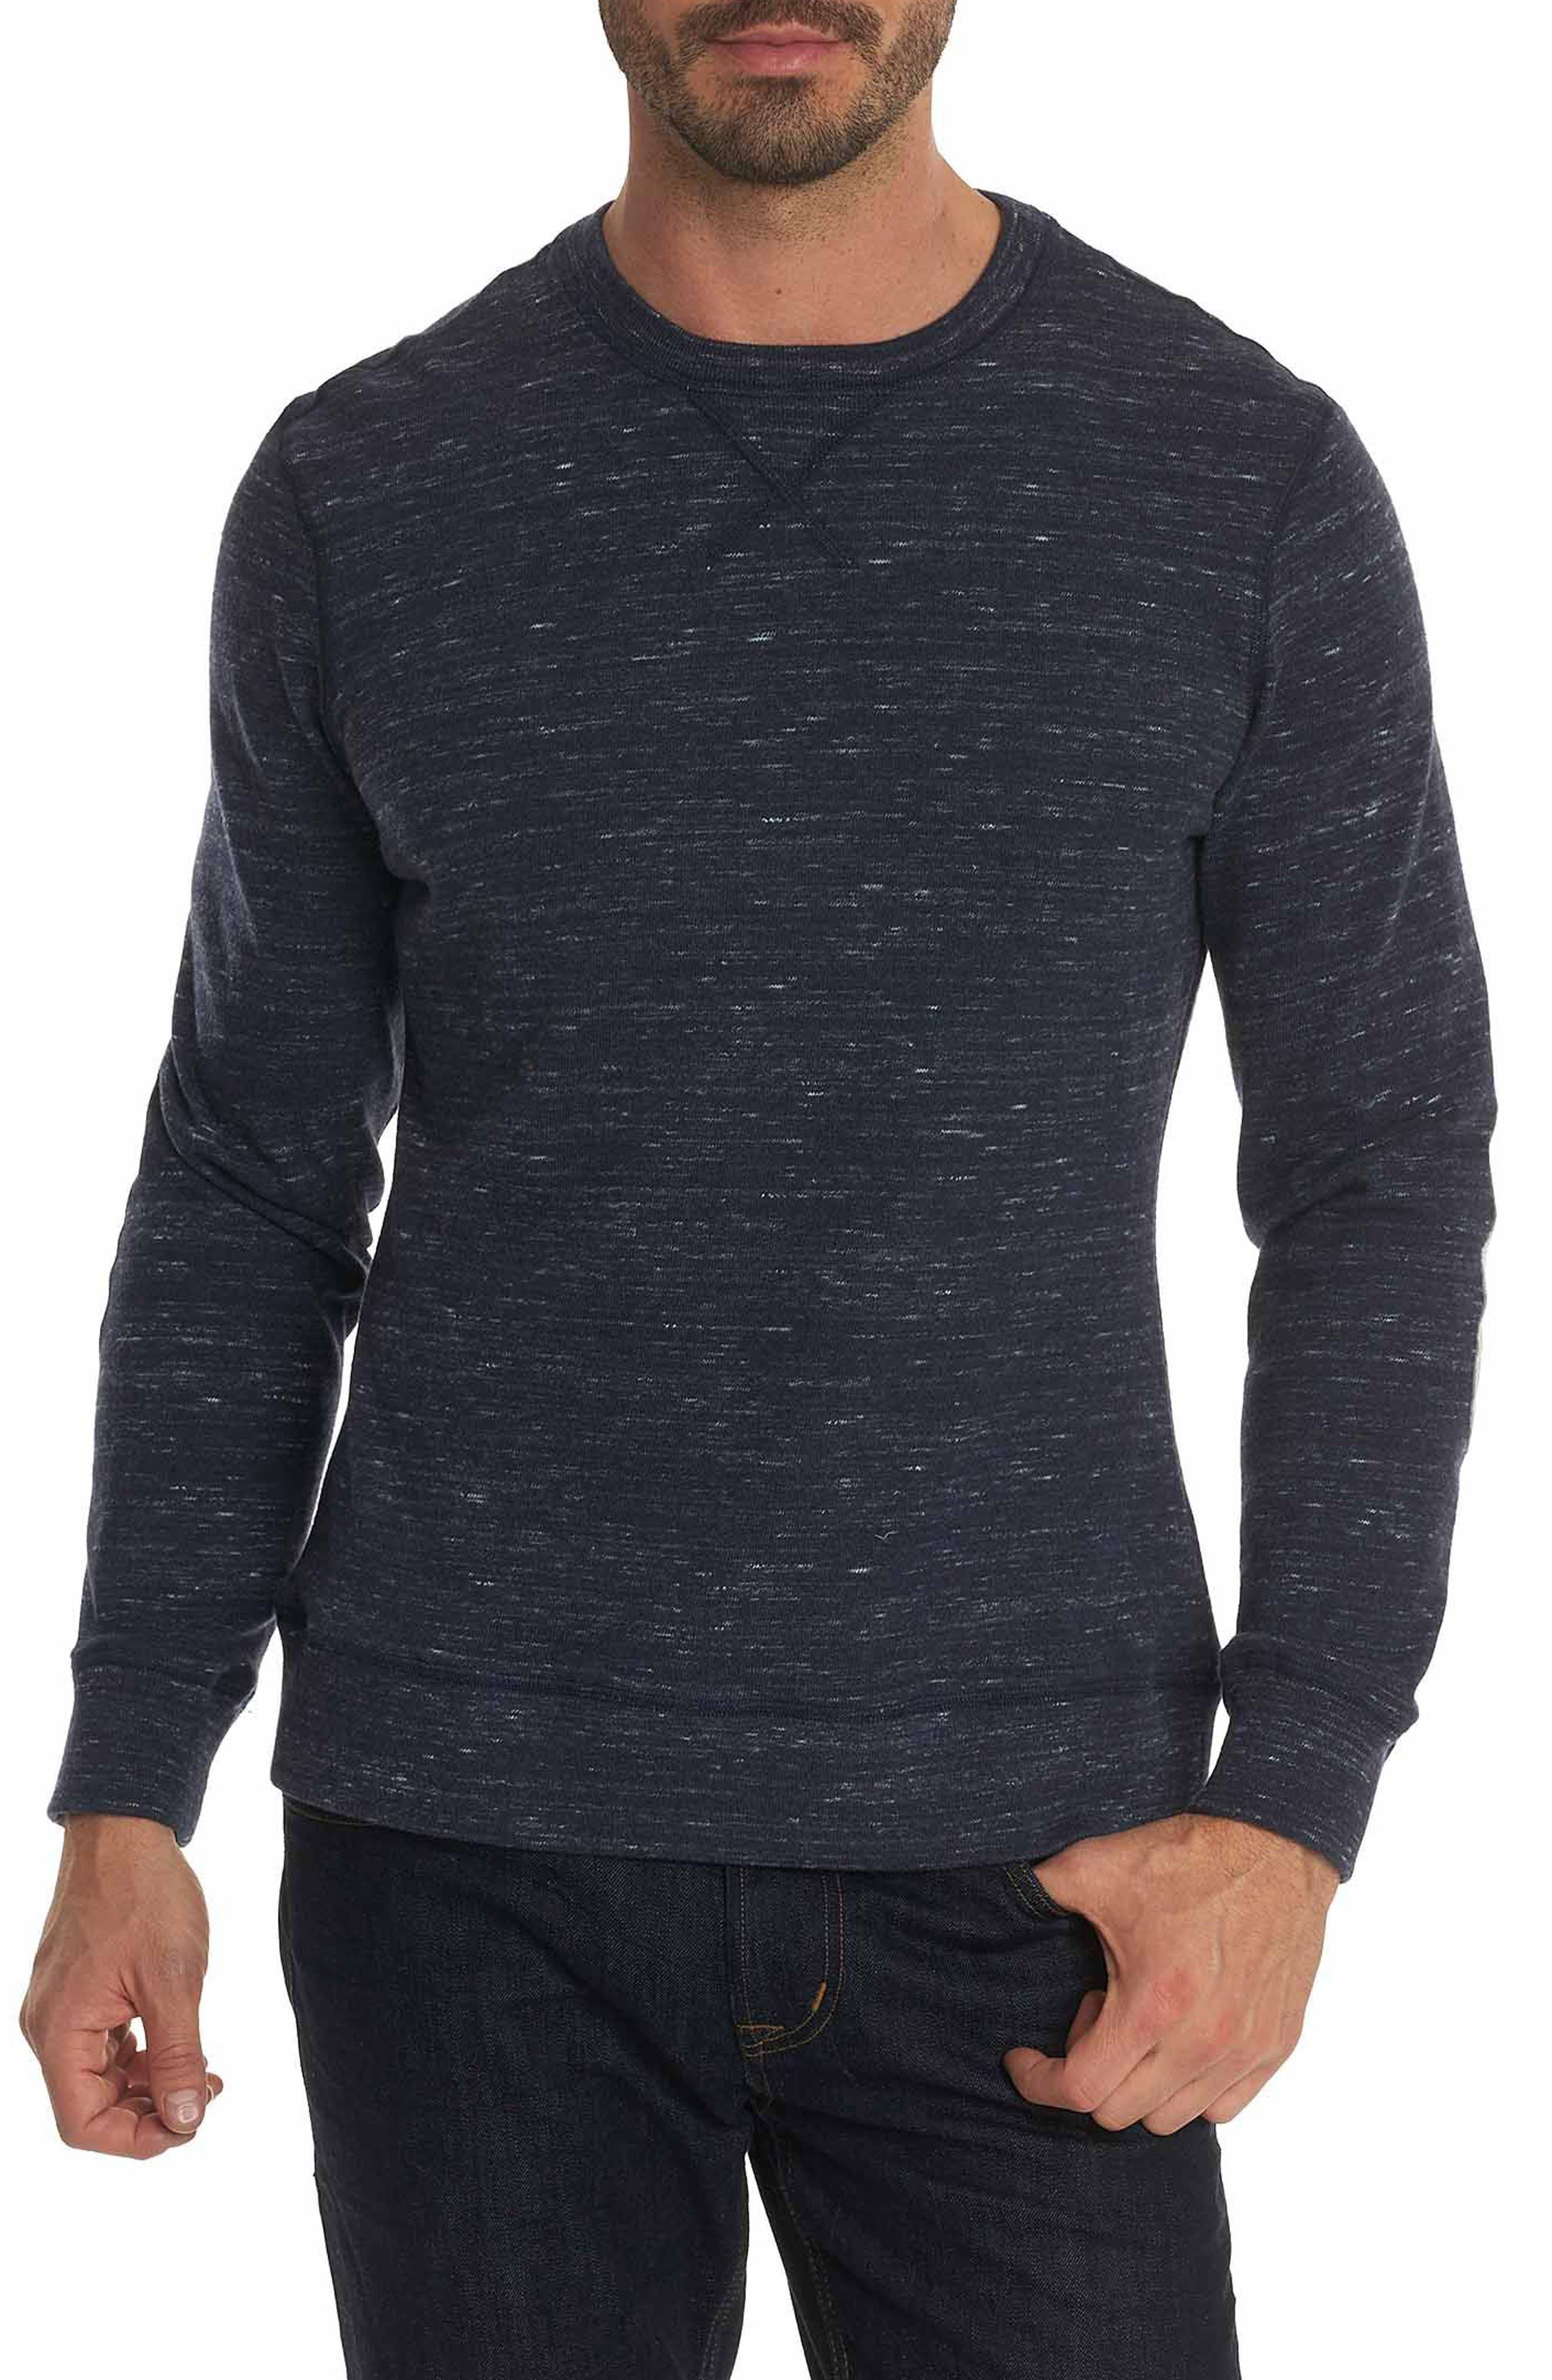 Endurance Elbow Patch Sweatshirt,                             Main thumbnail 2, color,